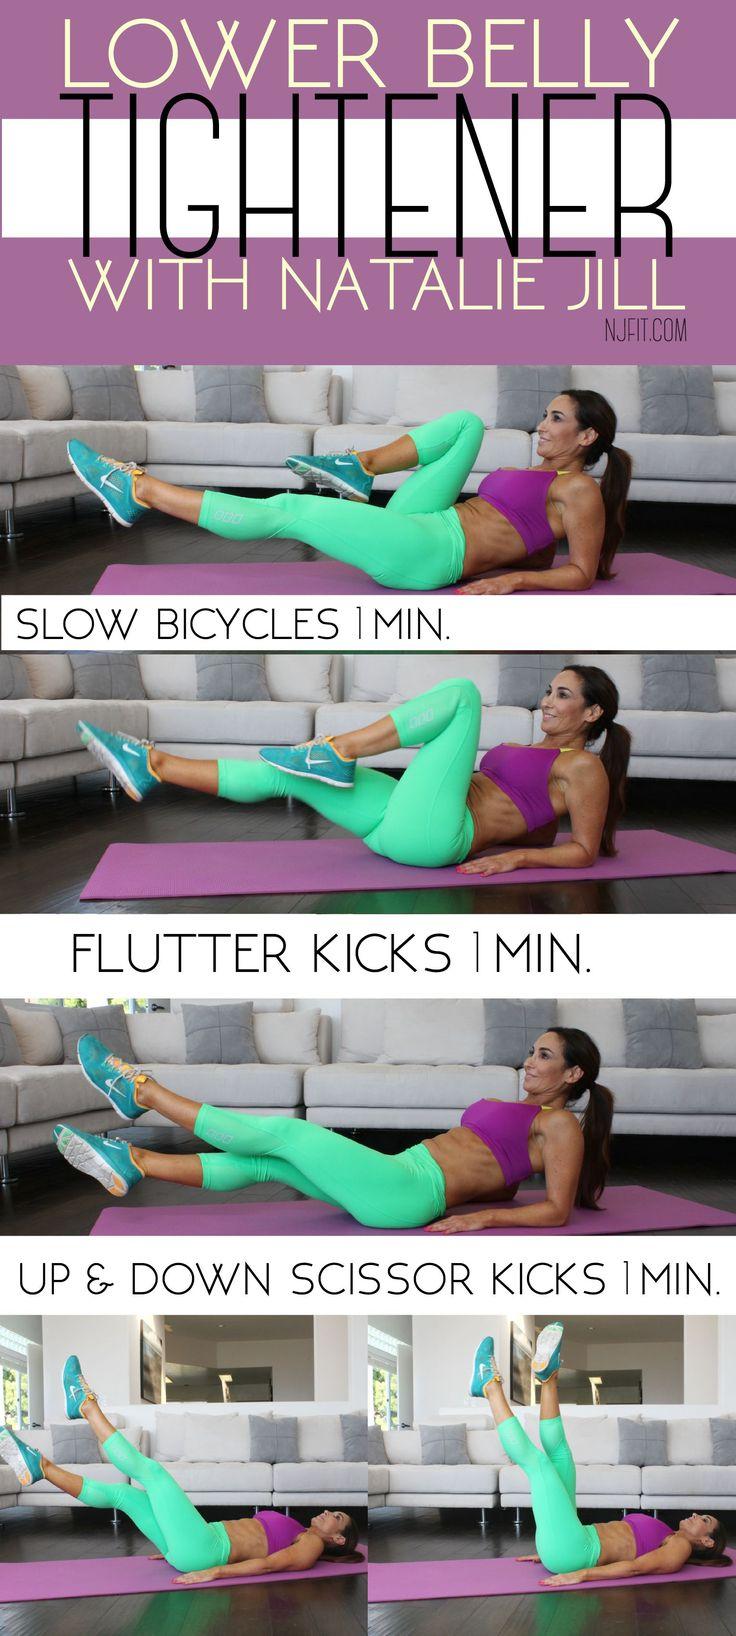 Weight Loss Workout Plan: Full 4-12 Week Exercise Program